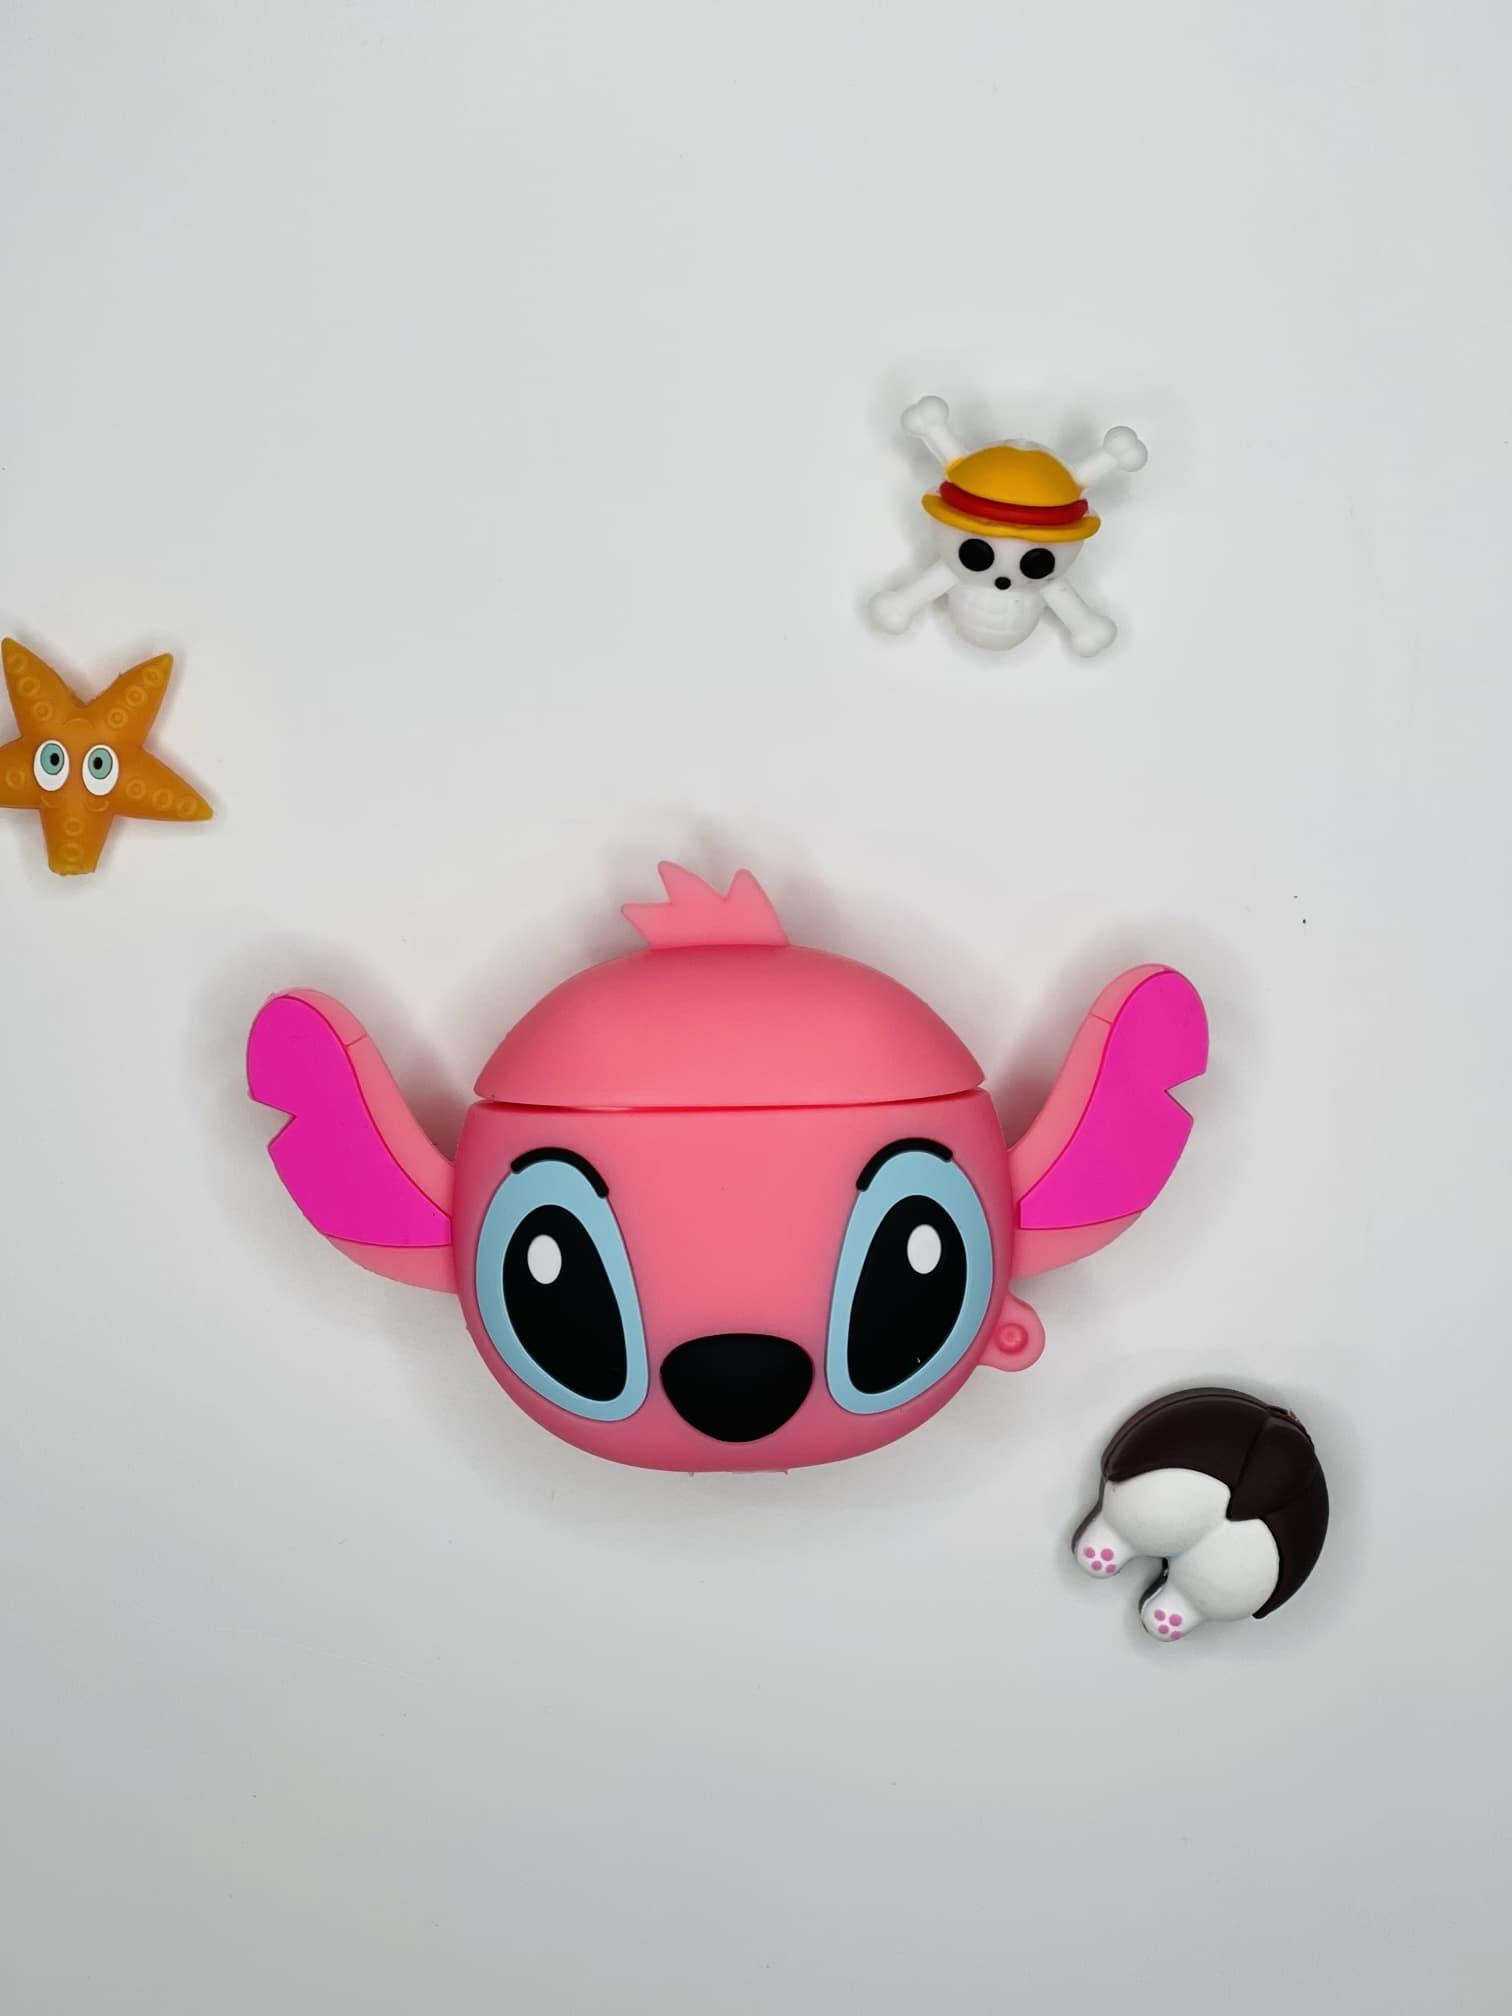 Stitch Figürlü AirPods 2 Kılıfı